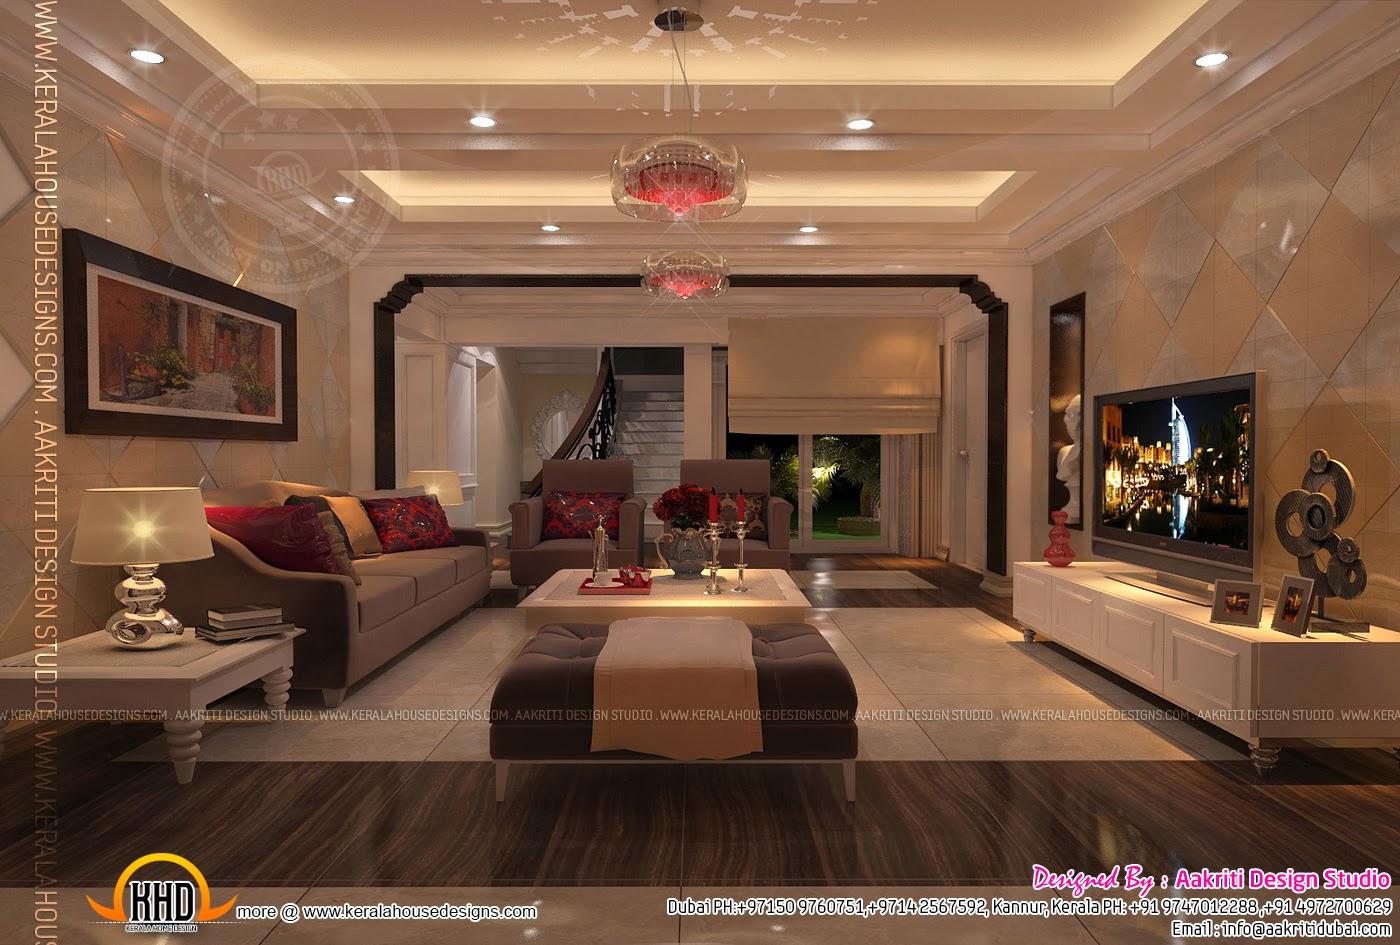 Living Room Designs In Dubai modern living room kerala style 27 design ideas - enhancedhomes